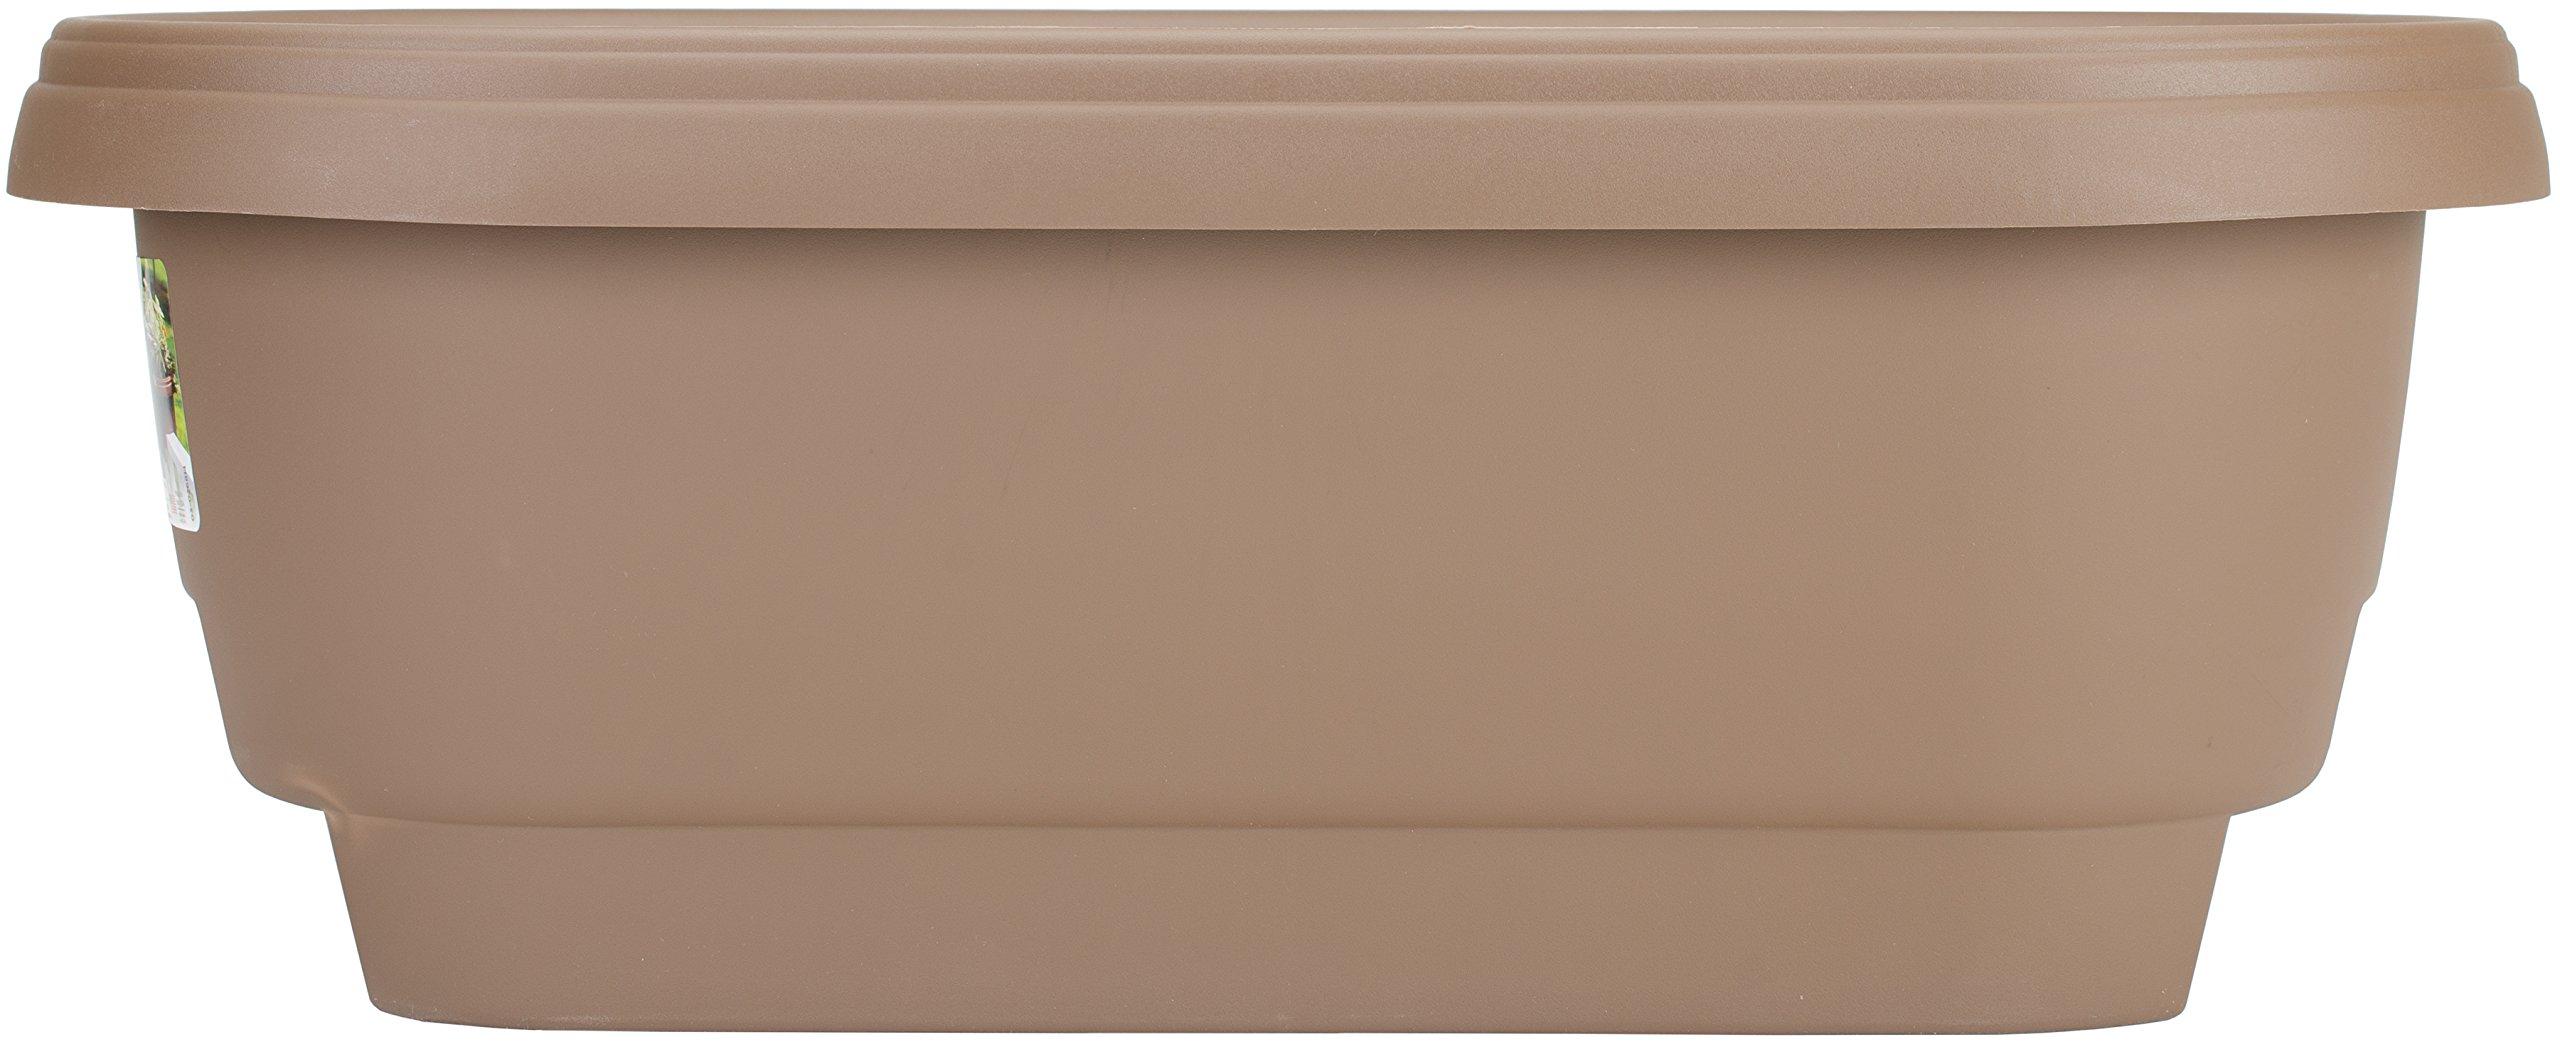 Bloem Deck Balcony Rail Planter 24'' Chocolate